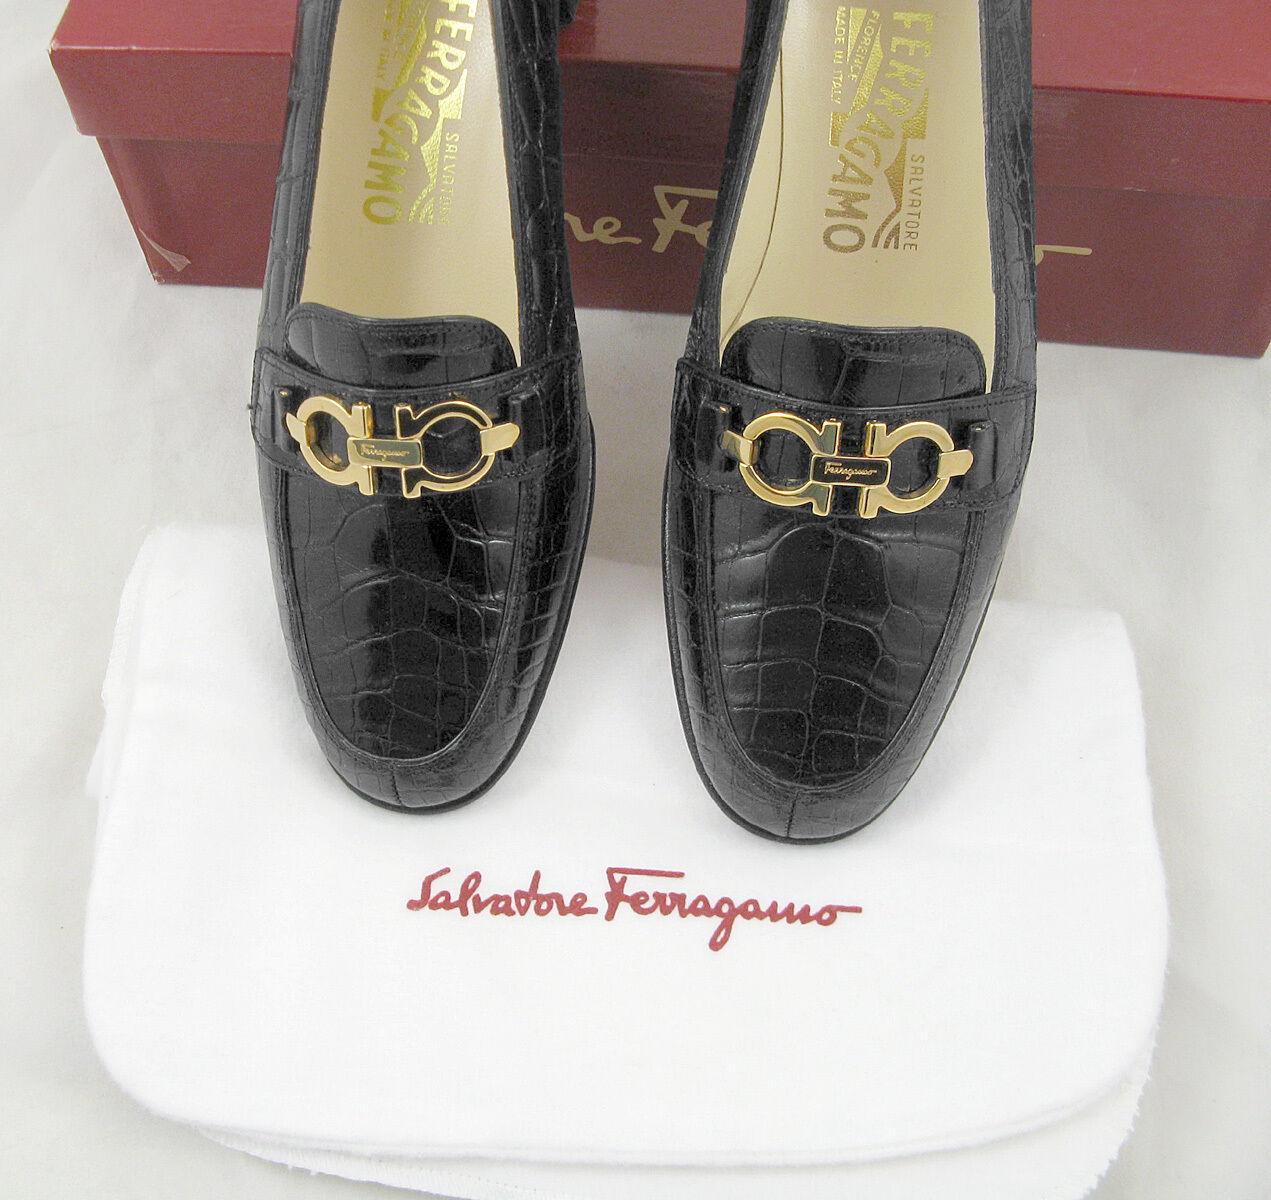 NEW Salvatore Ferragamo Alligator shoes shoes shoes  5 C   Black with gold Horsebit Hardware cbf48f